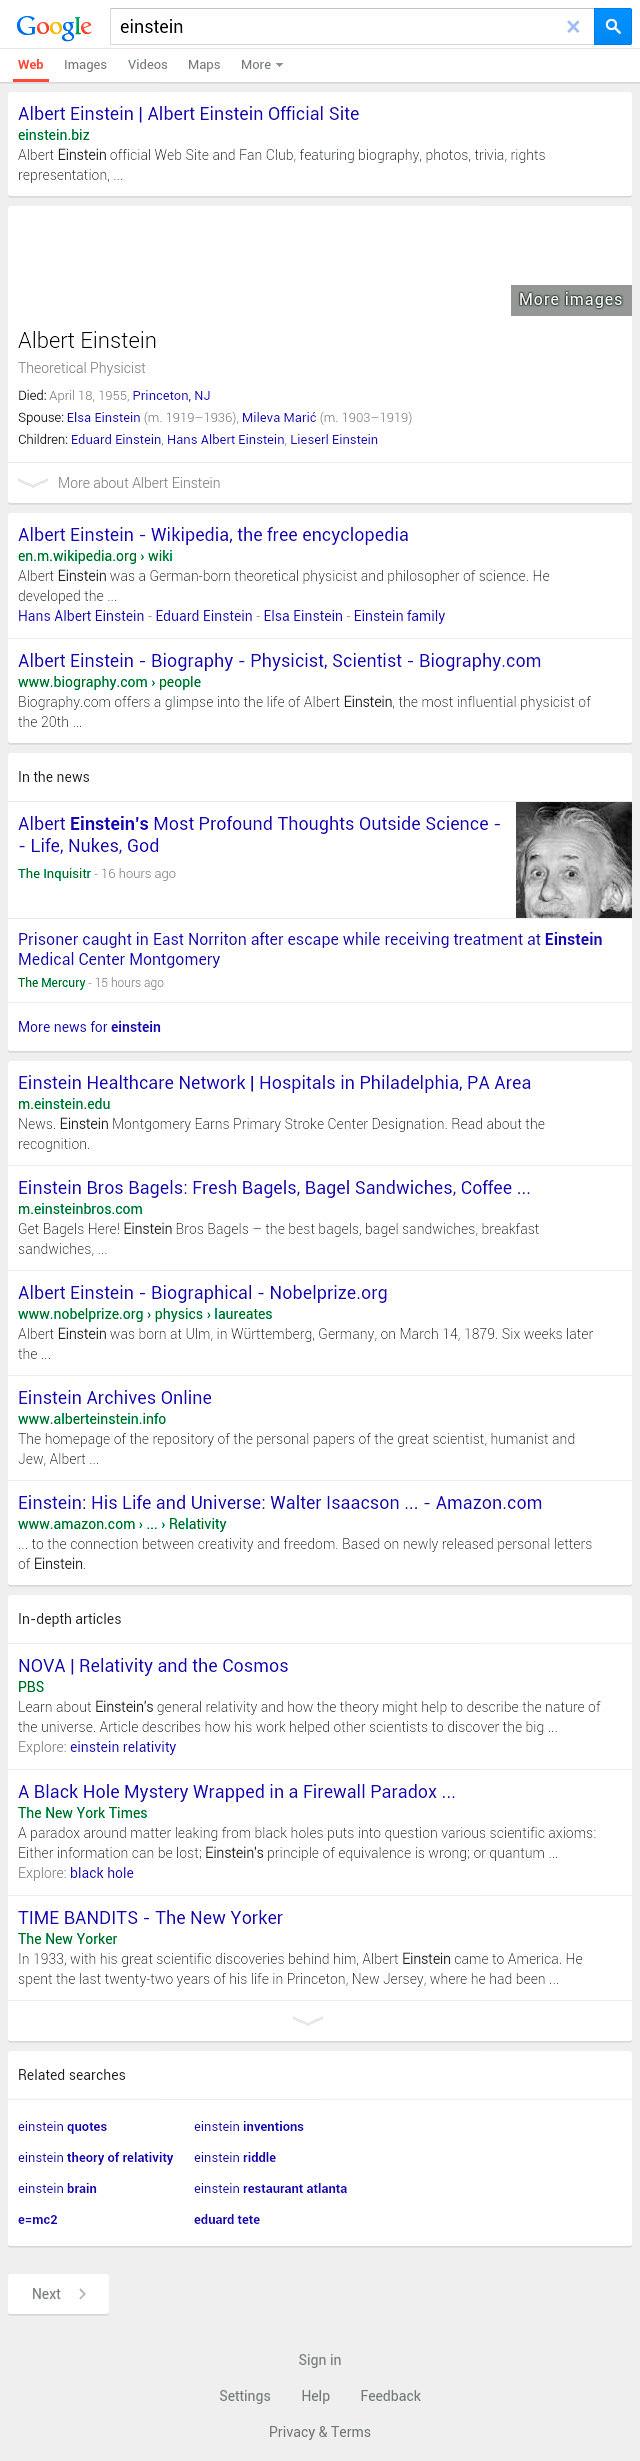 Android_google-nexus-4_4.2_landscape